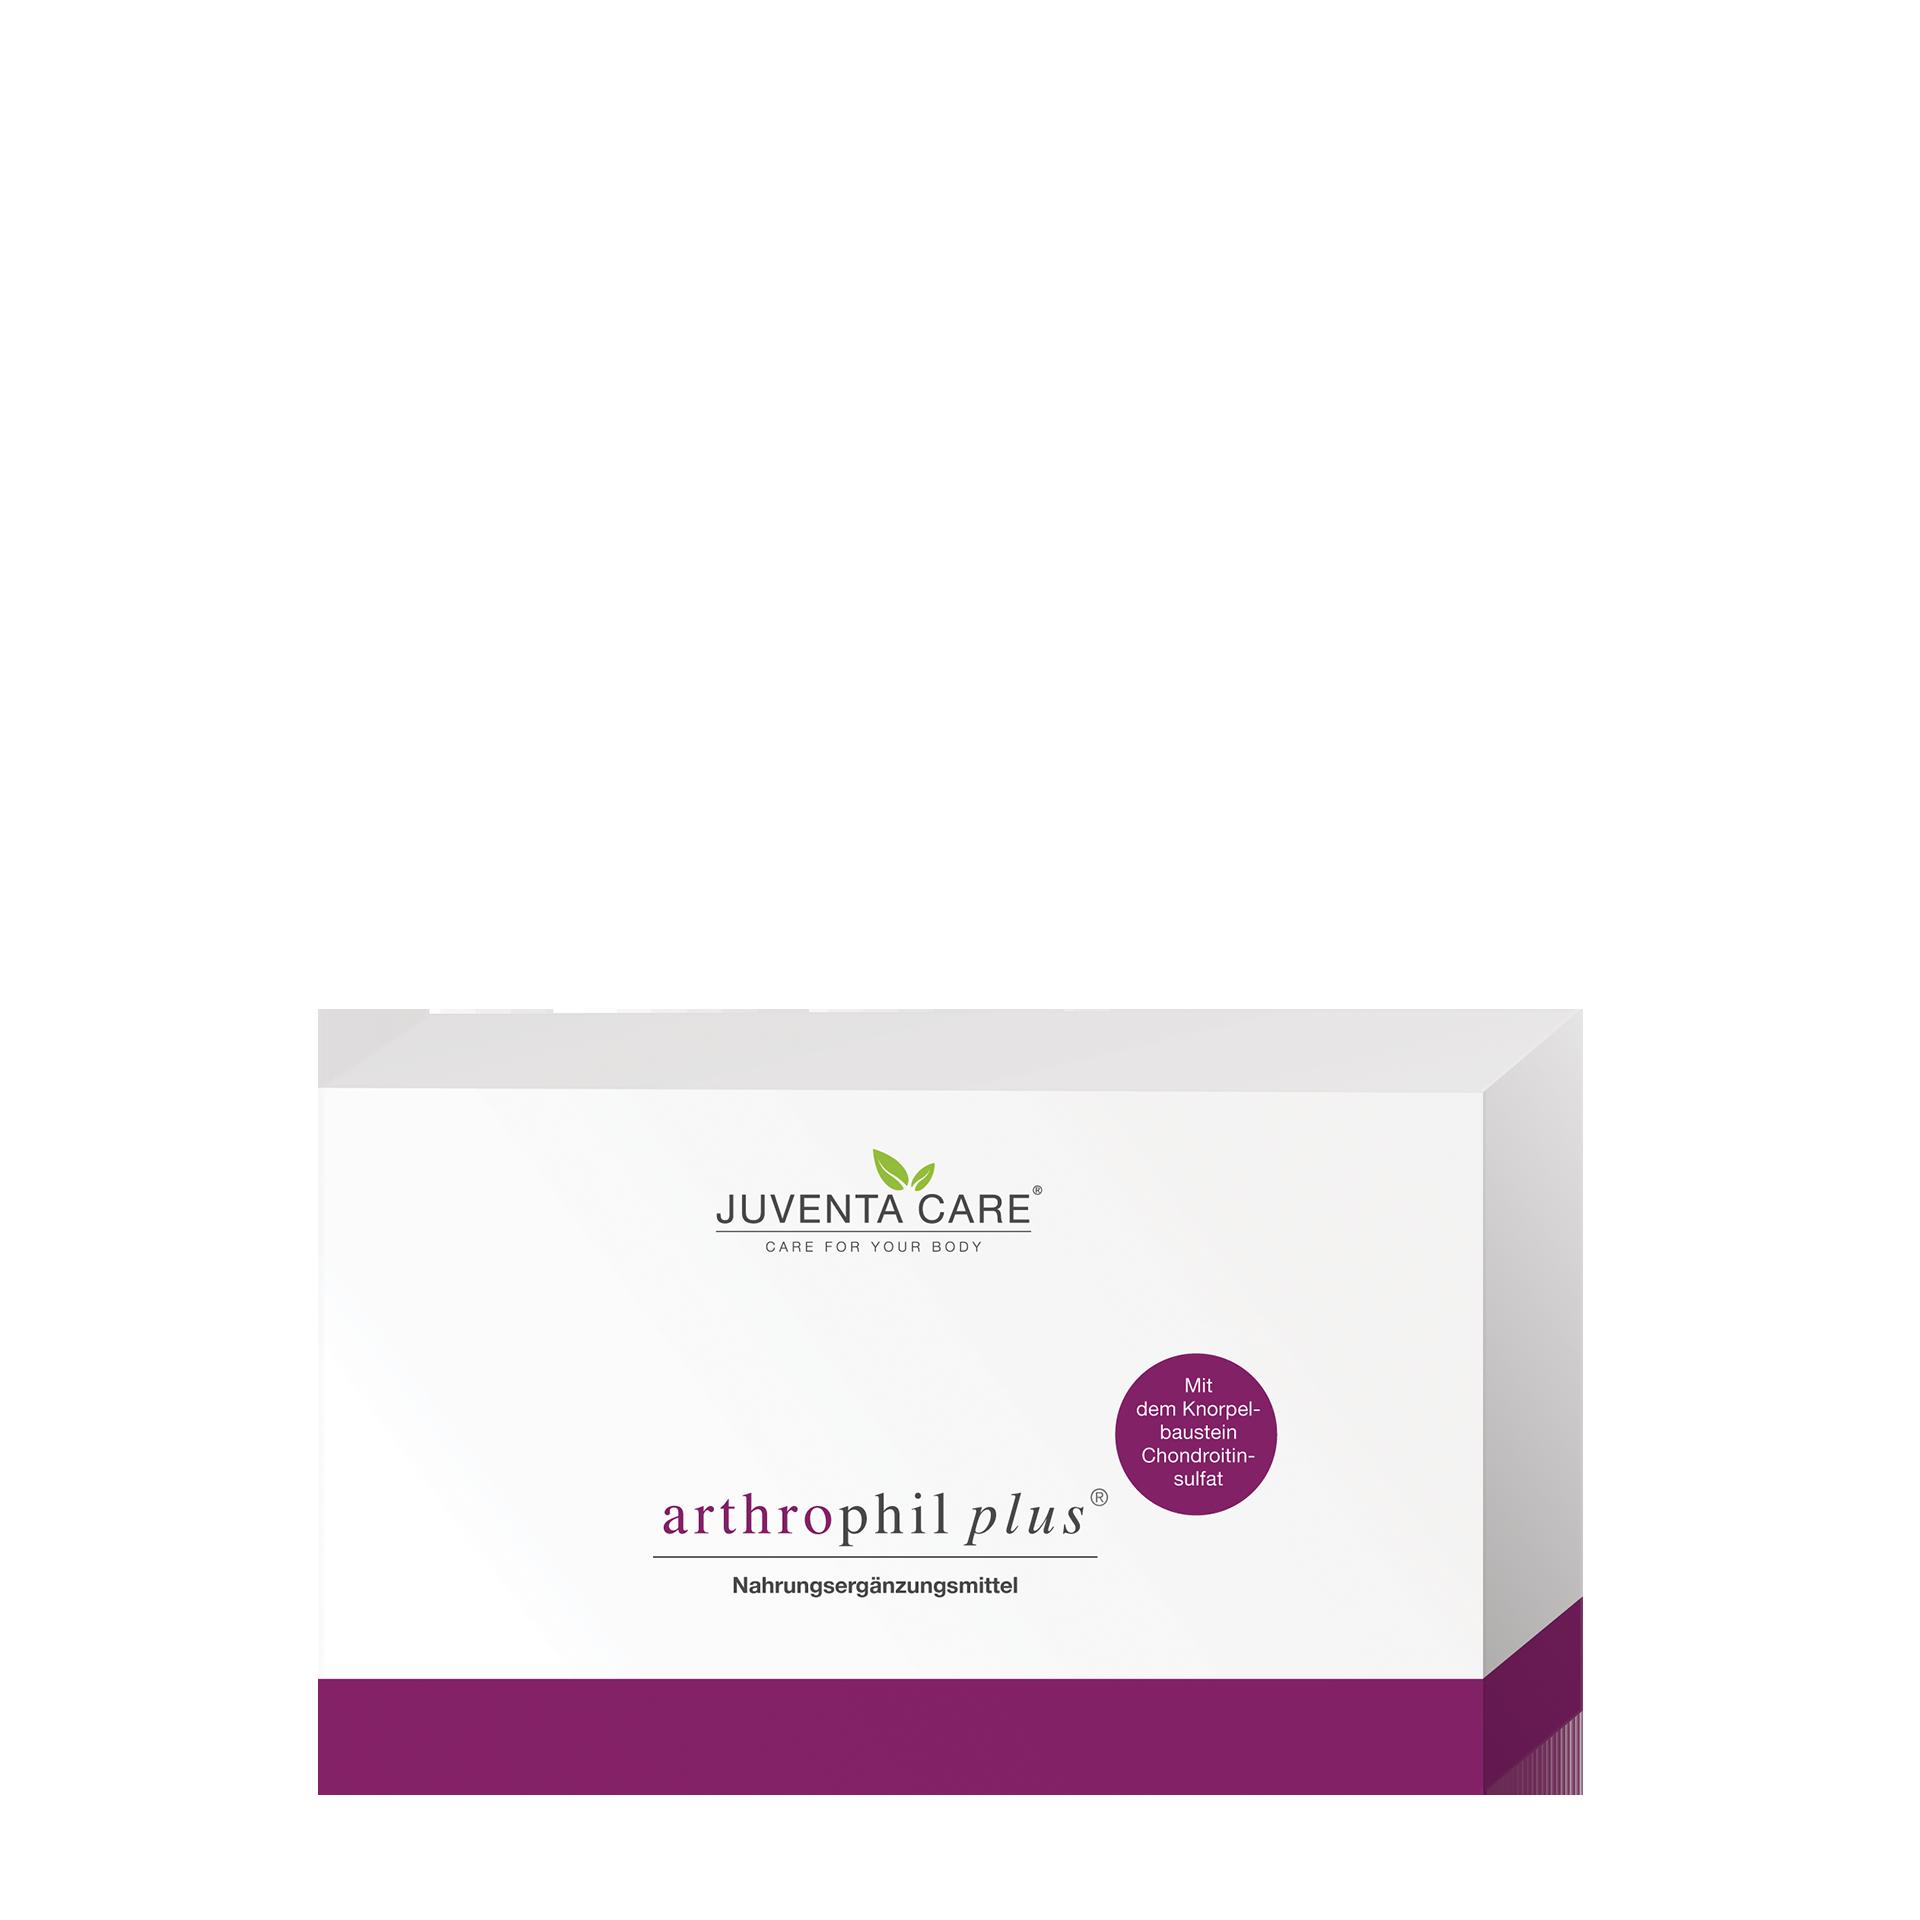 Arthrophil plus, 60 Kapseln